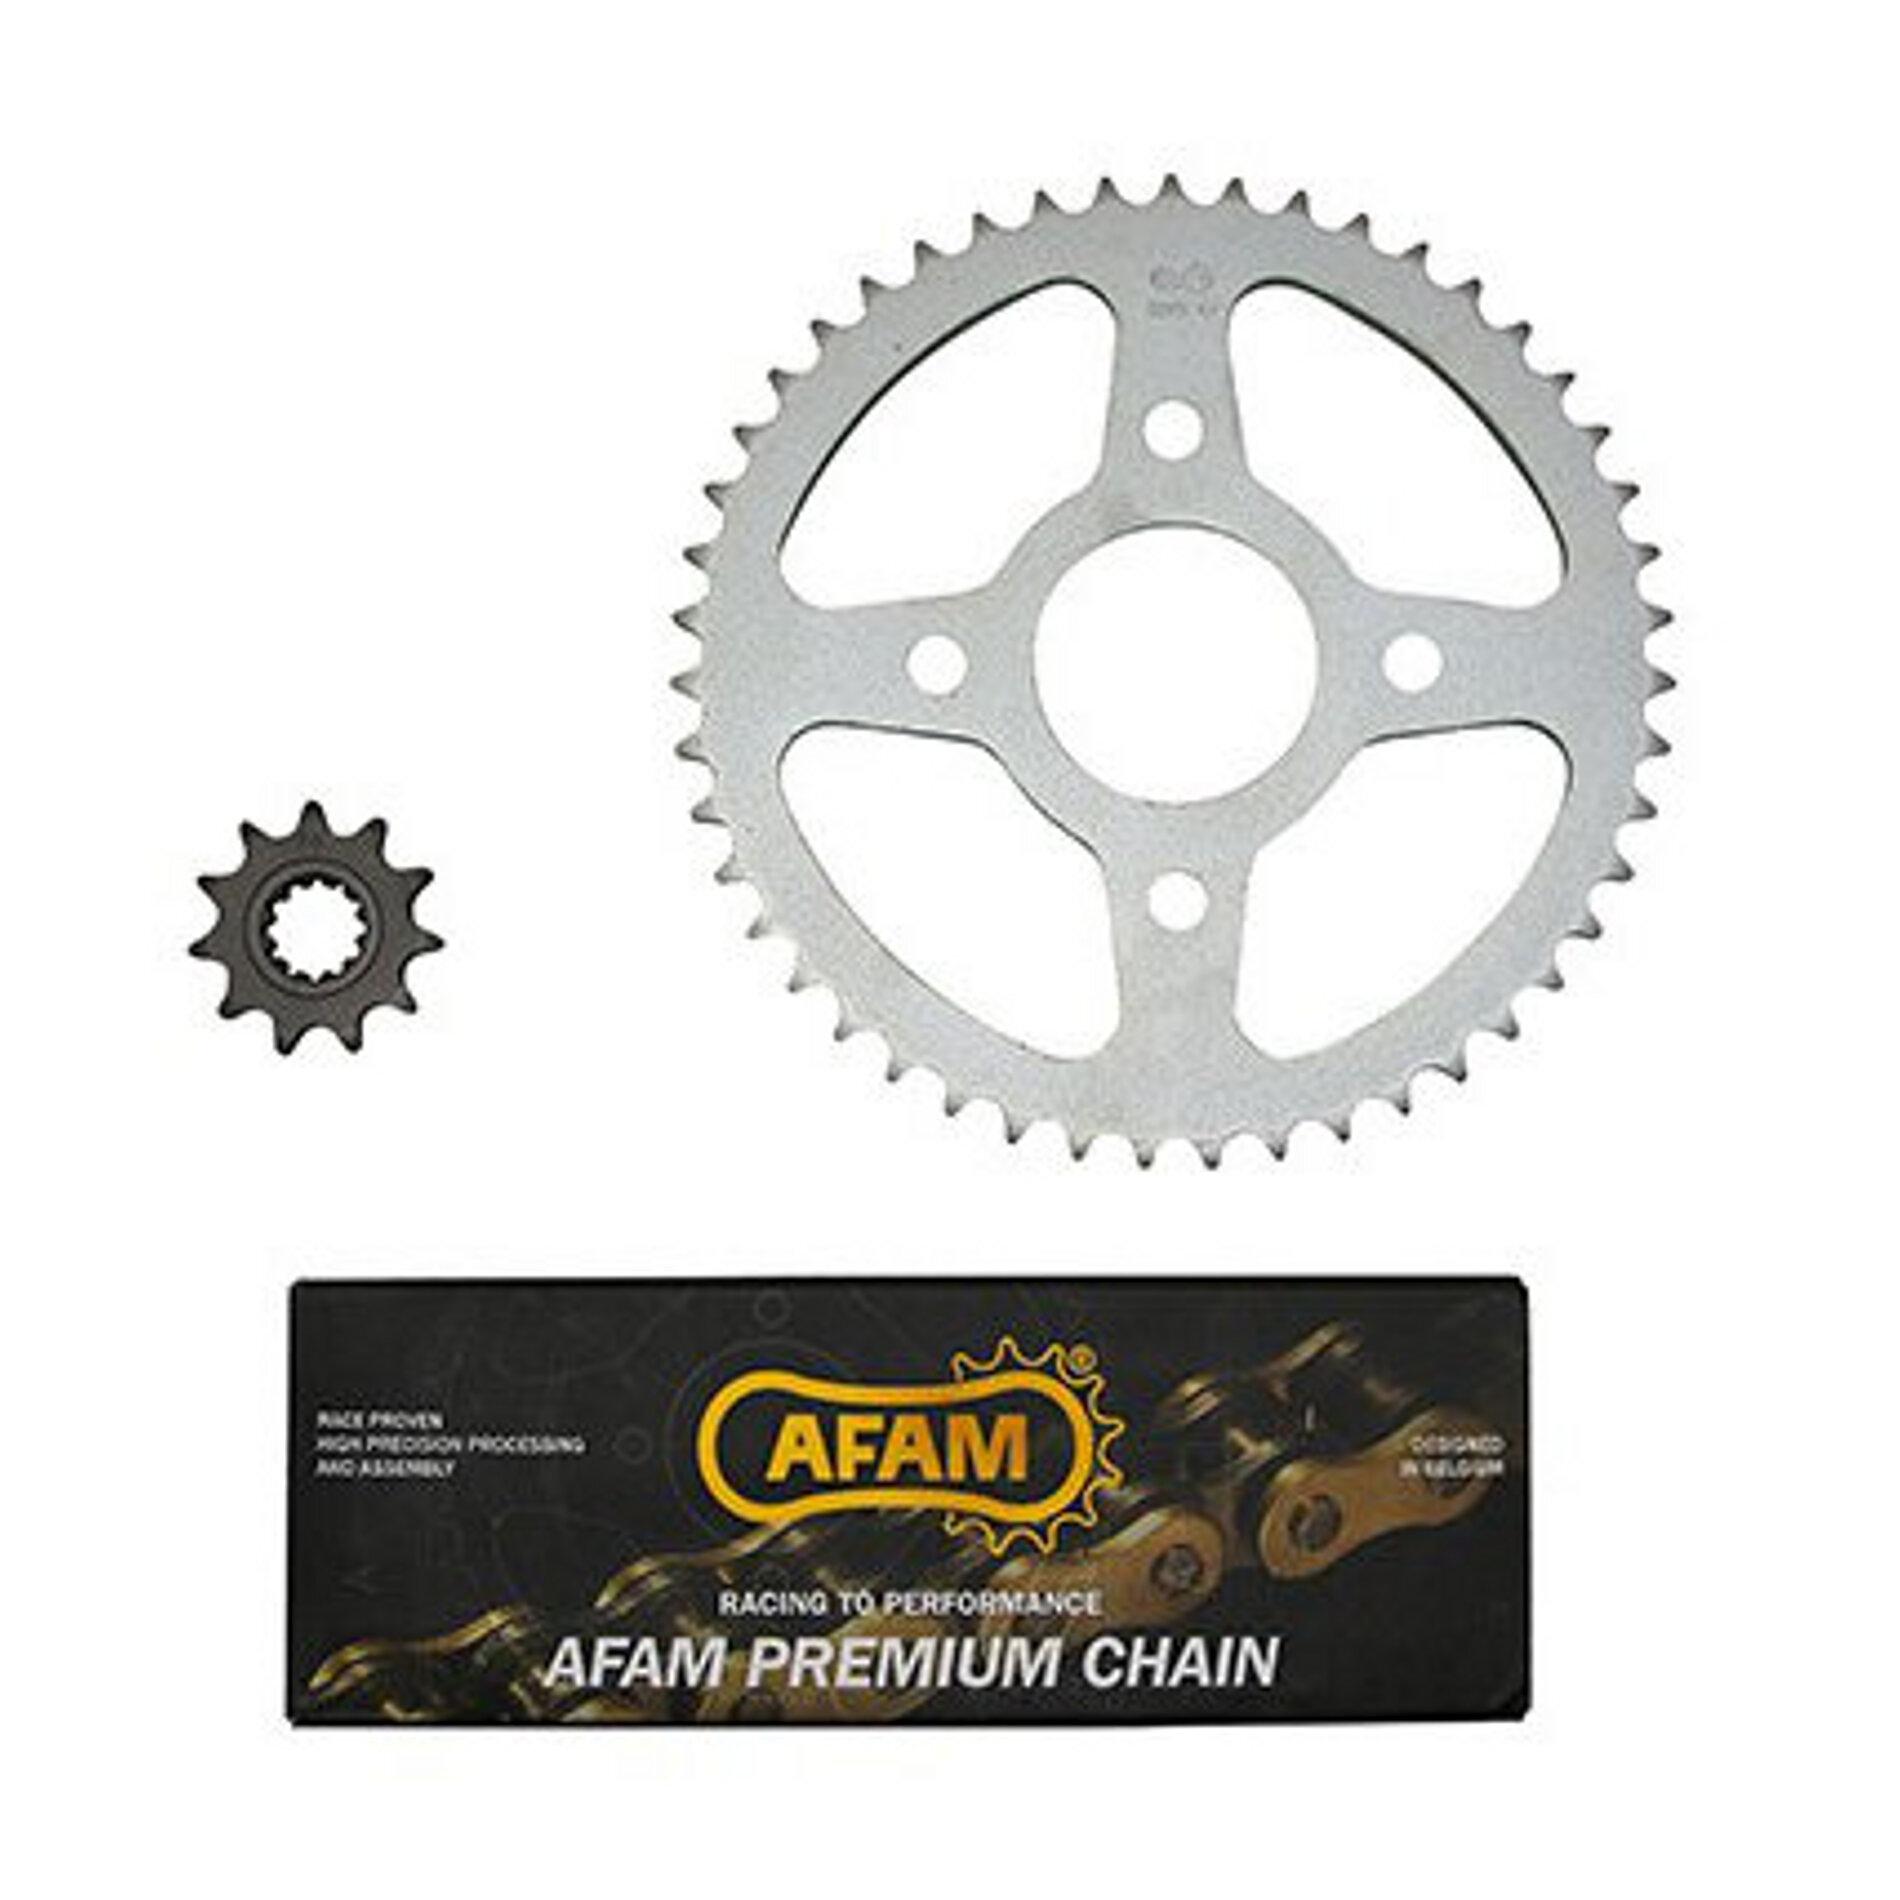 Kit chaîne Afam pas 420 11X47 MBK X-Power / Yamaha TZR 03-